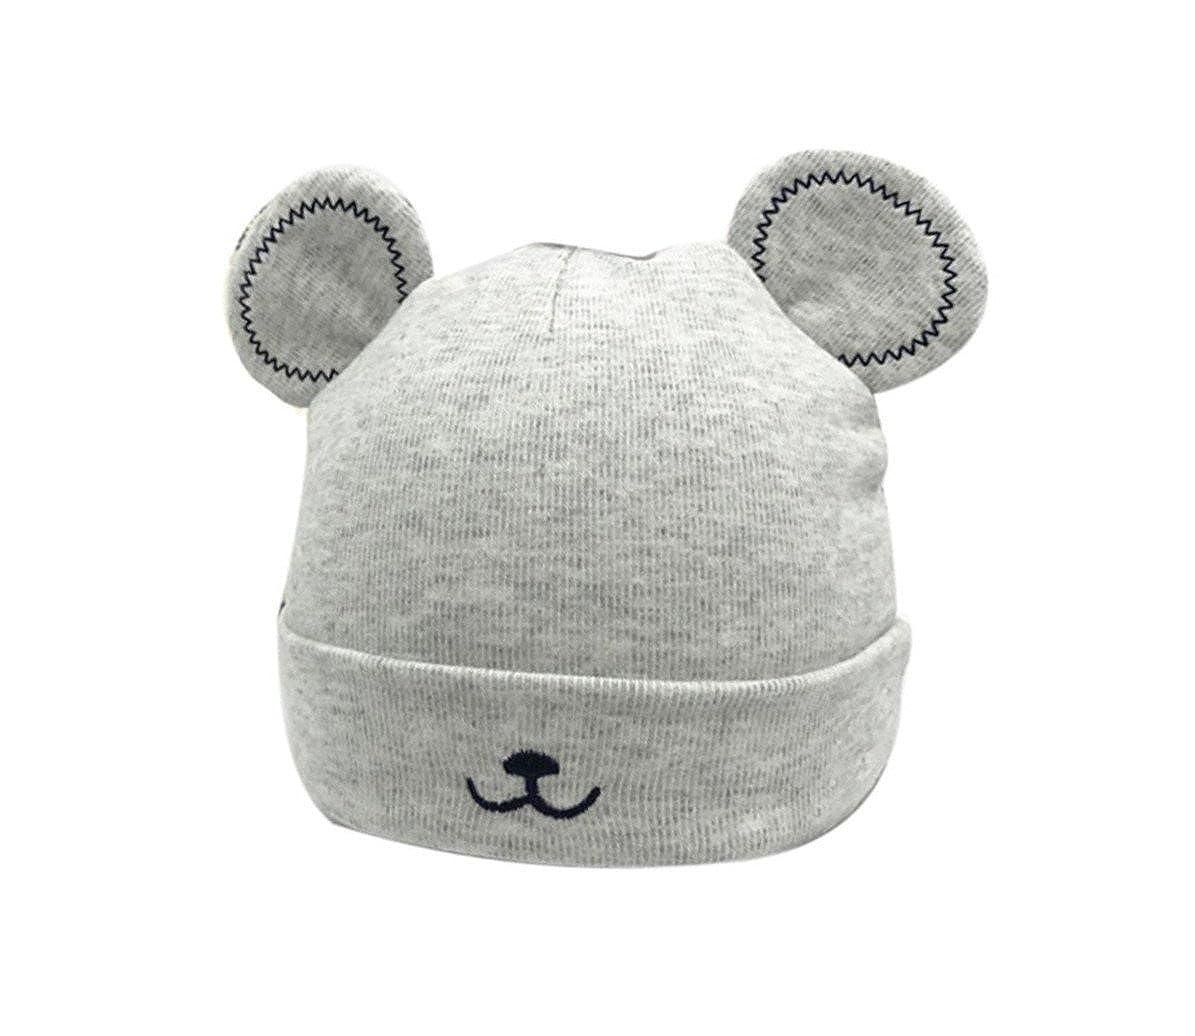 Boys Hats, SHOBDW Baby Girls Cute Cartoon Ears Plush Warm Winter Beanie Thick Cap Toddler Newborn Gifts 0-1 Years) SHOBDW-043